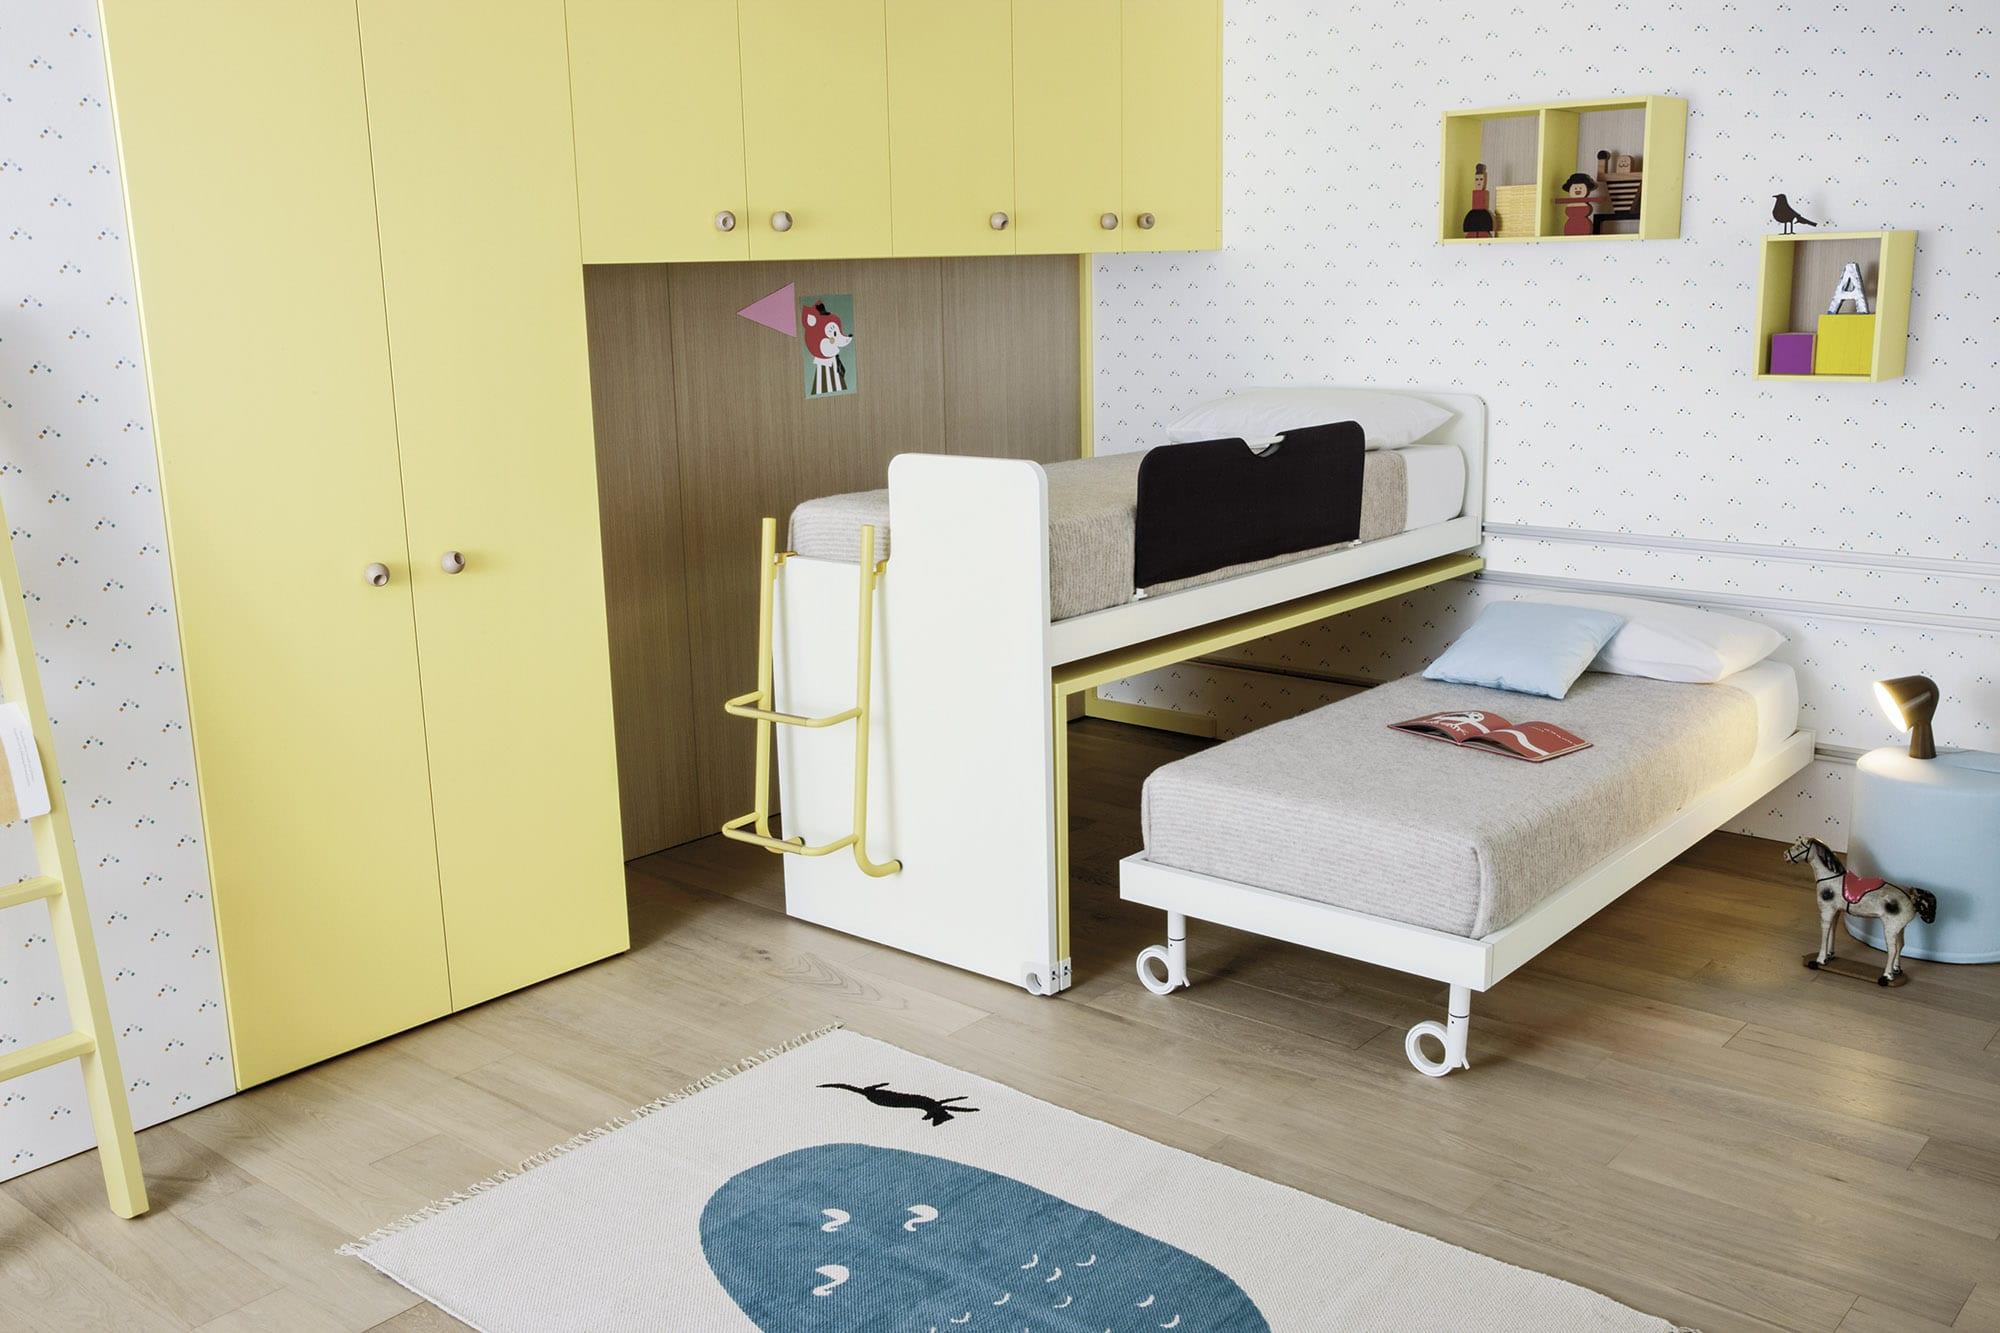 Camerette moderne battistella - Ricci casa armadi ...